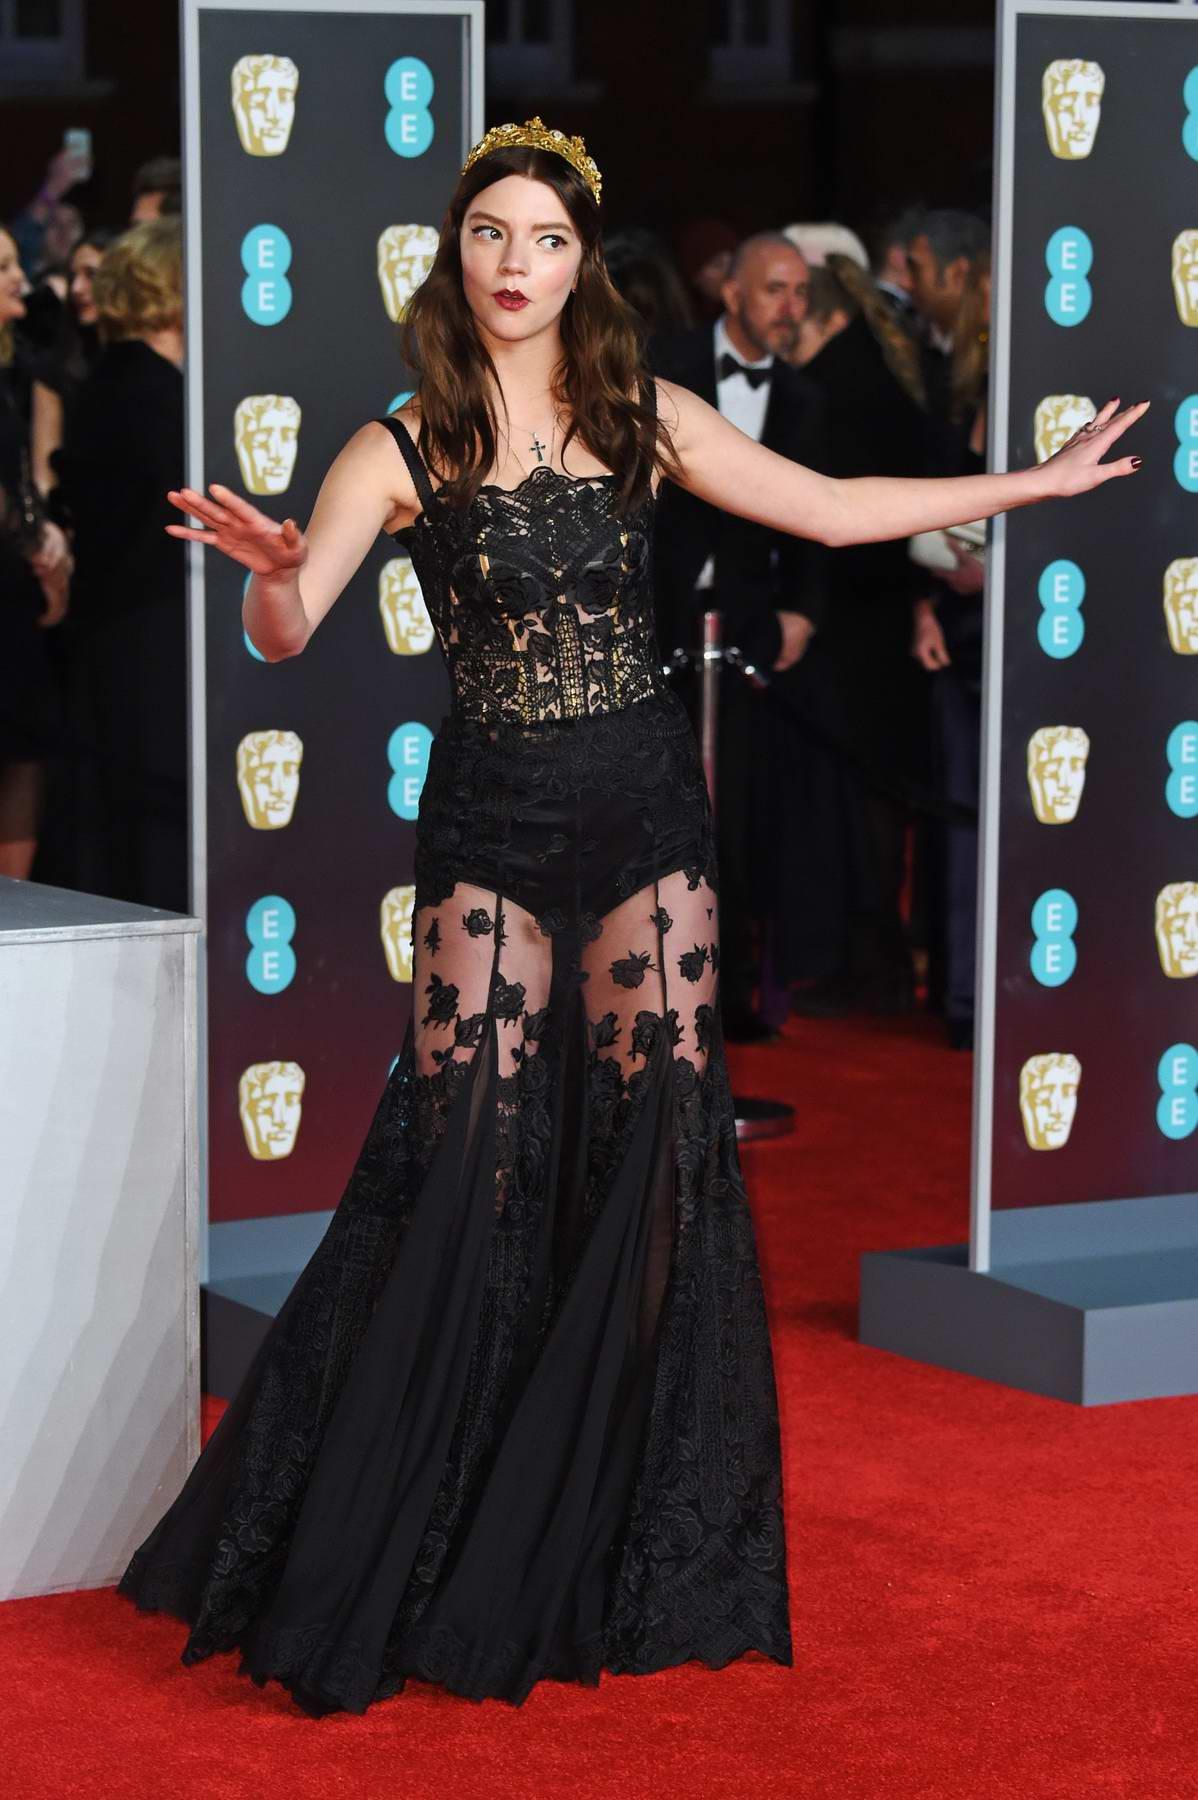 Anna Taylor-Joy attends 71st British Academy Film Awards at Royal Albert Hall in London